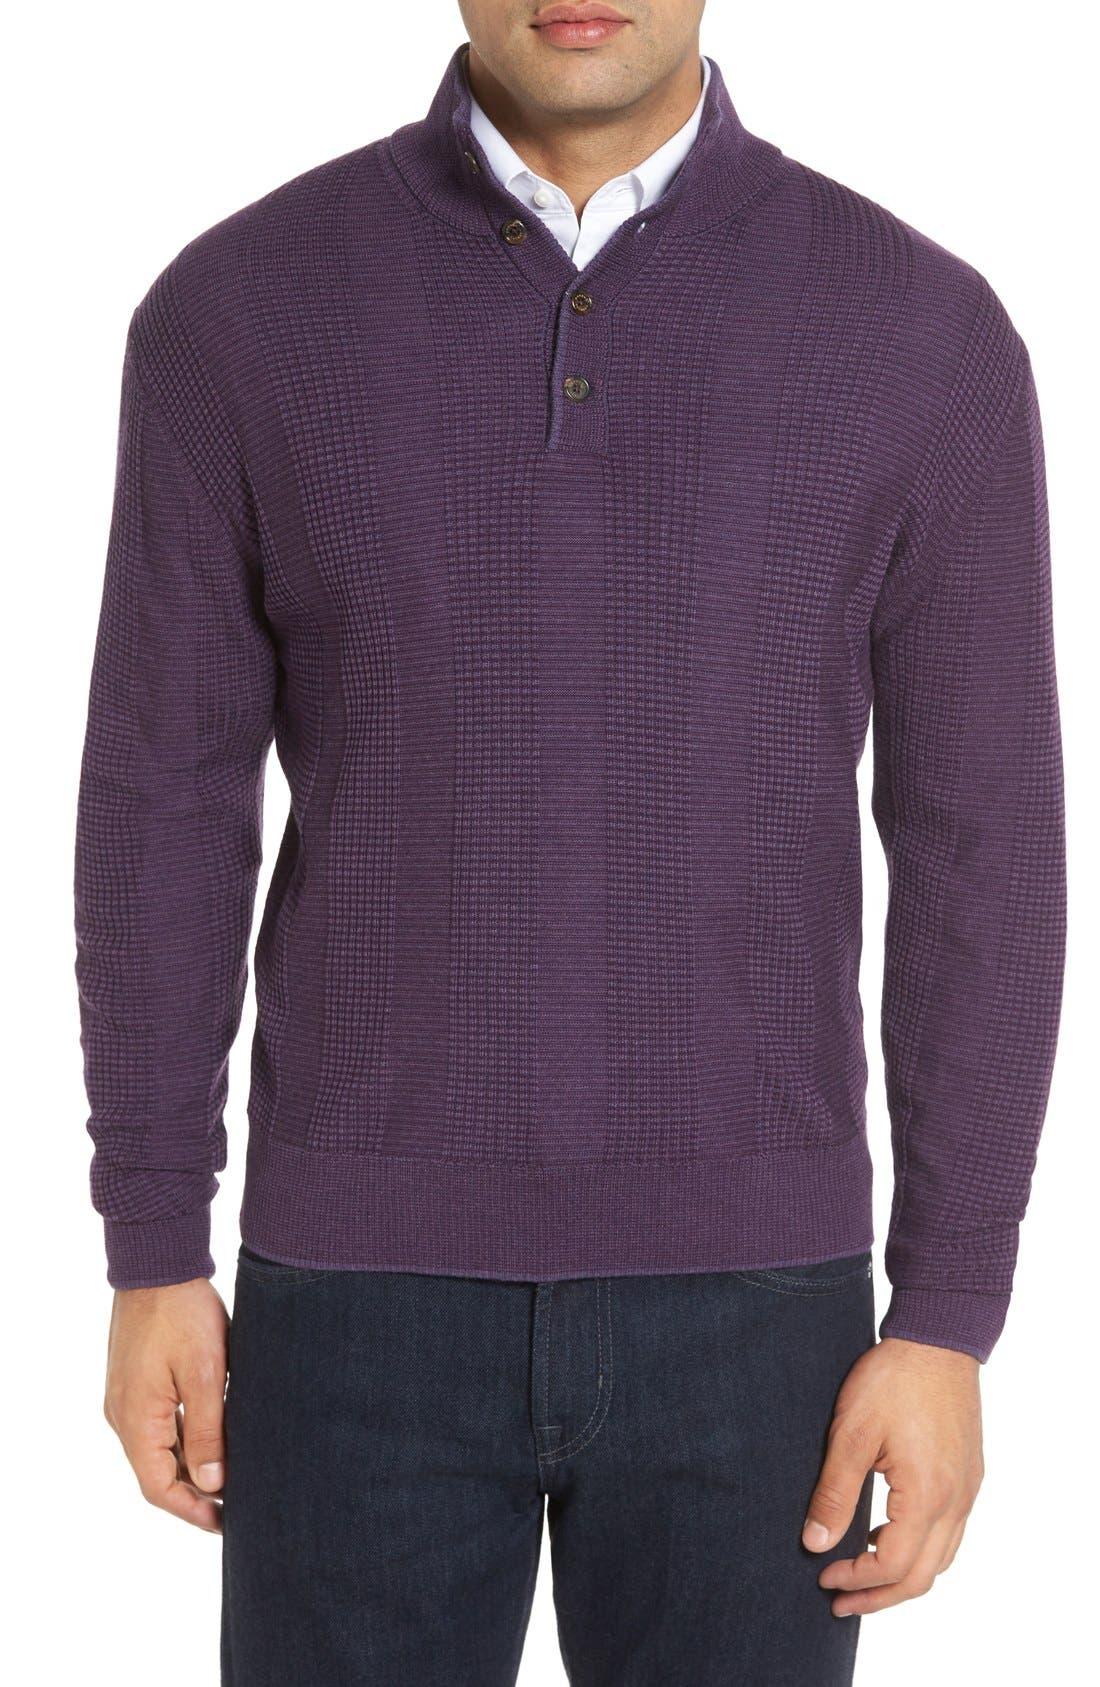 Robert Talbott 'Legacy Collection' Mock Neck Wool Sweater